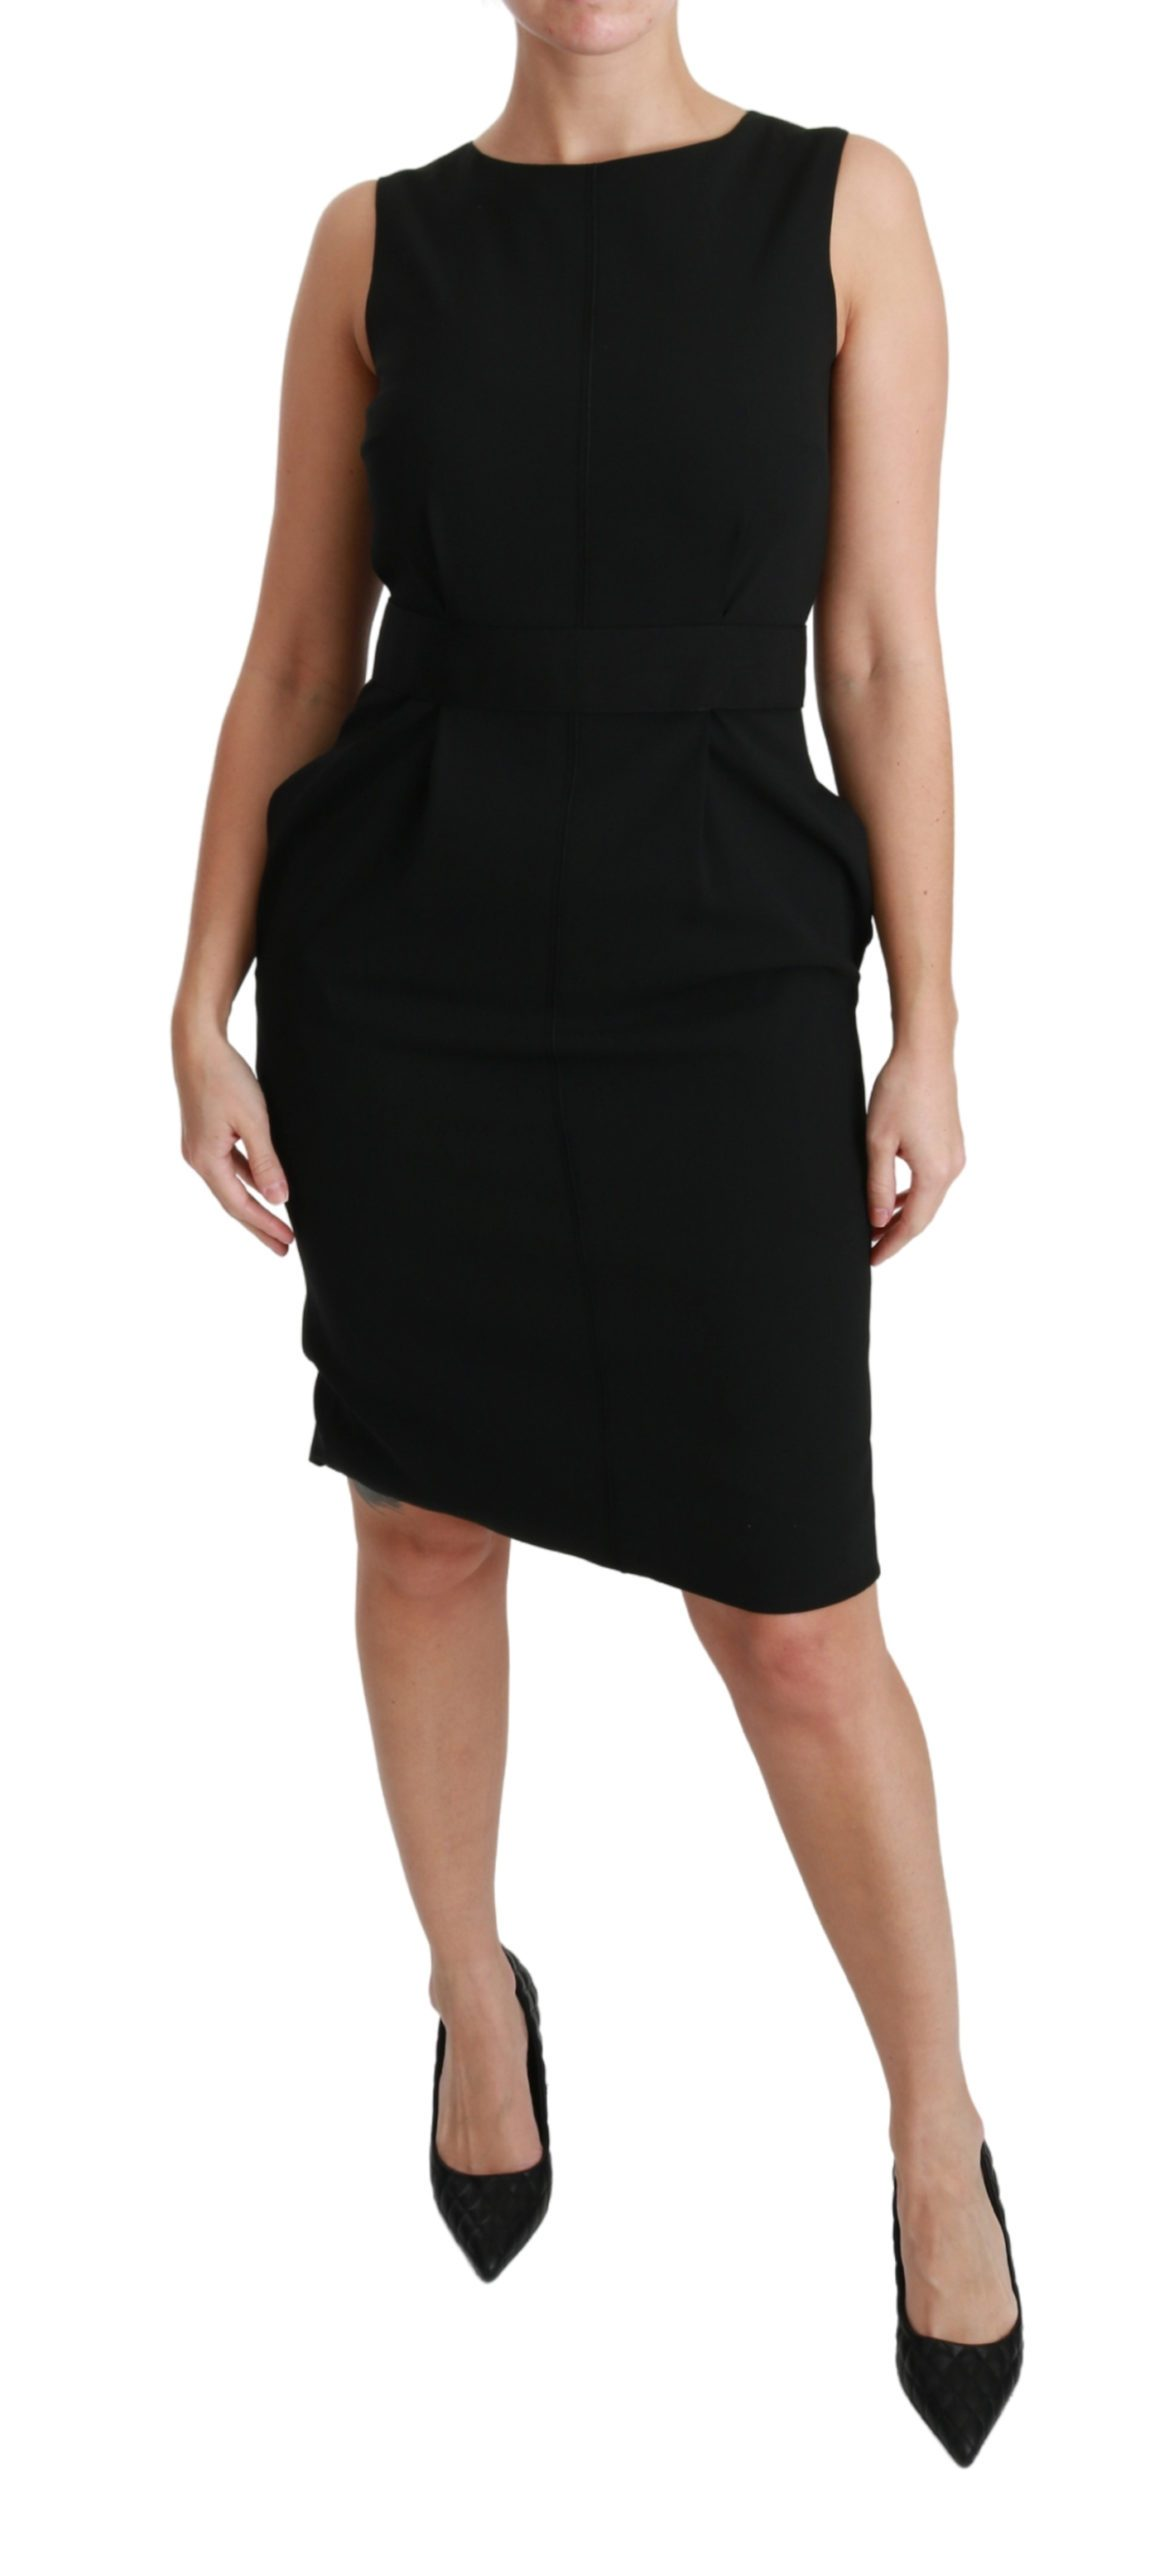 Dolce & Gabbana Women's Floral Sheath Stretch Formal Dress Black DR2165 - IT36 | XS